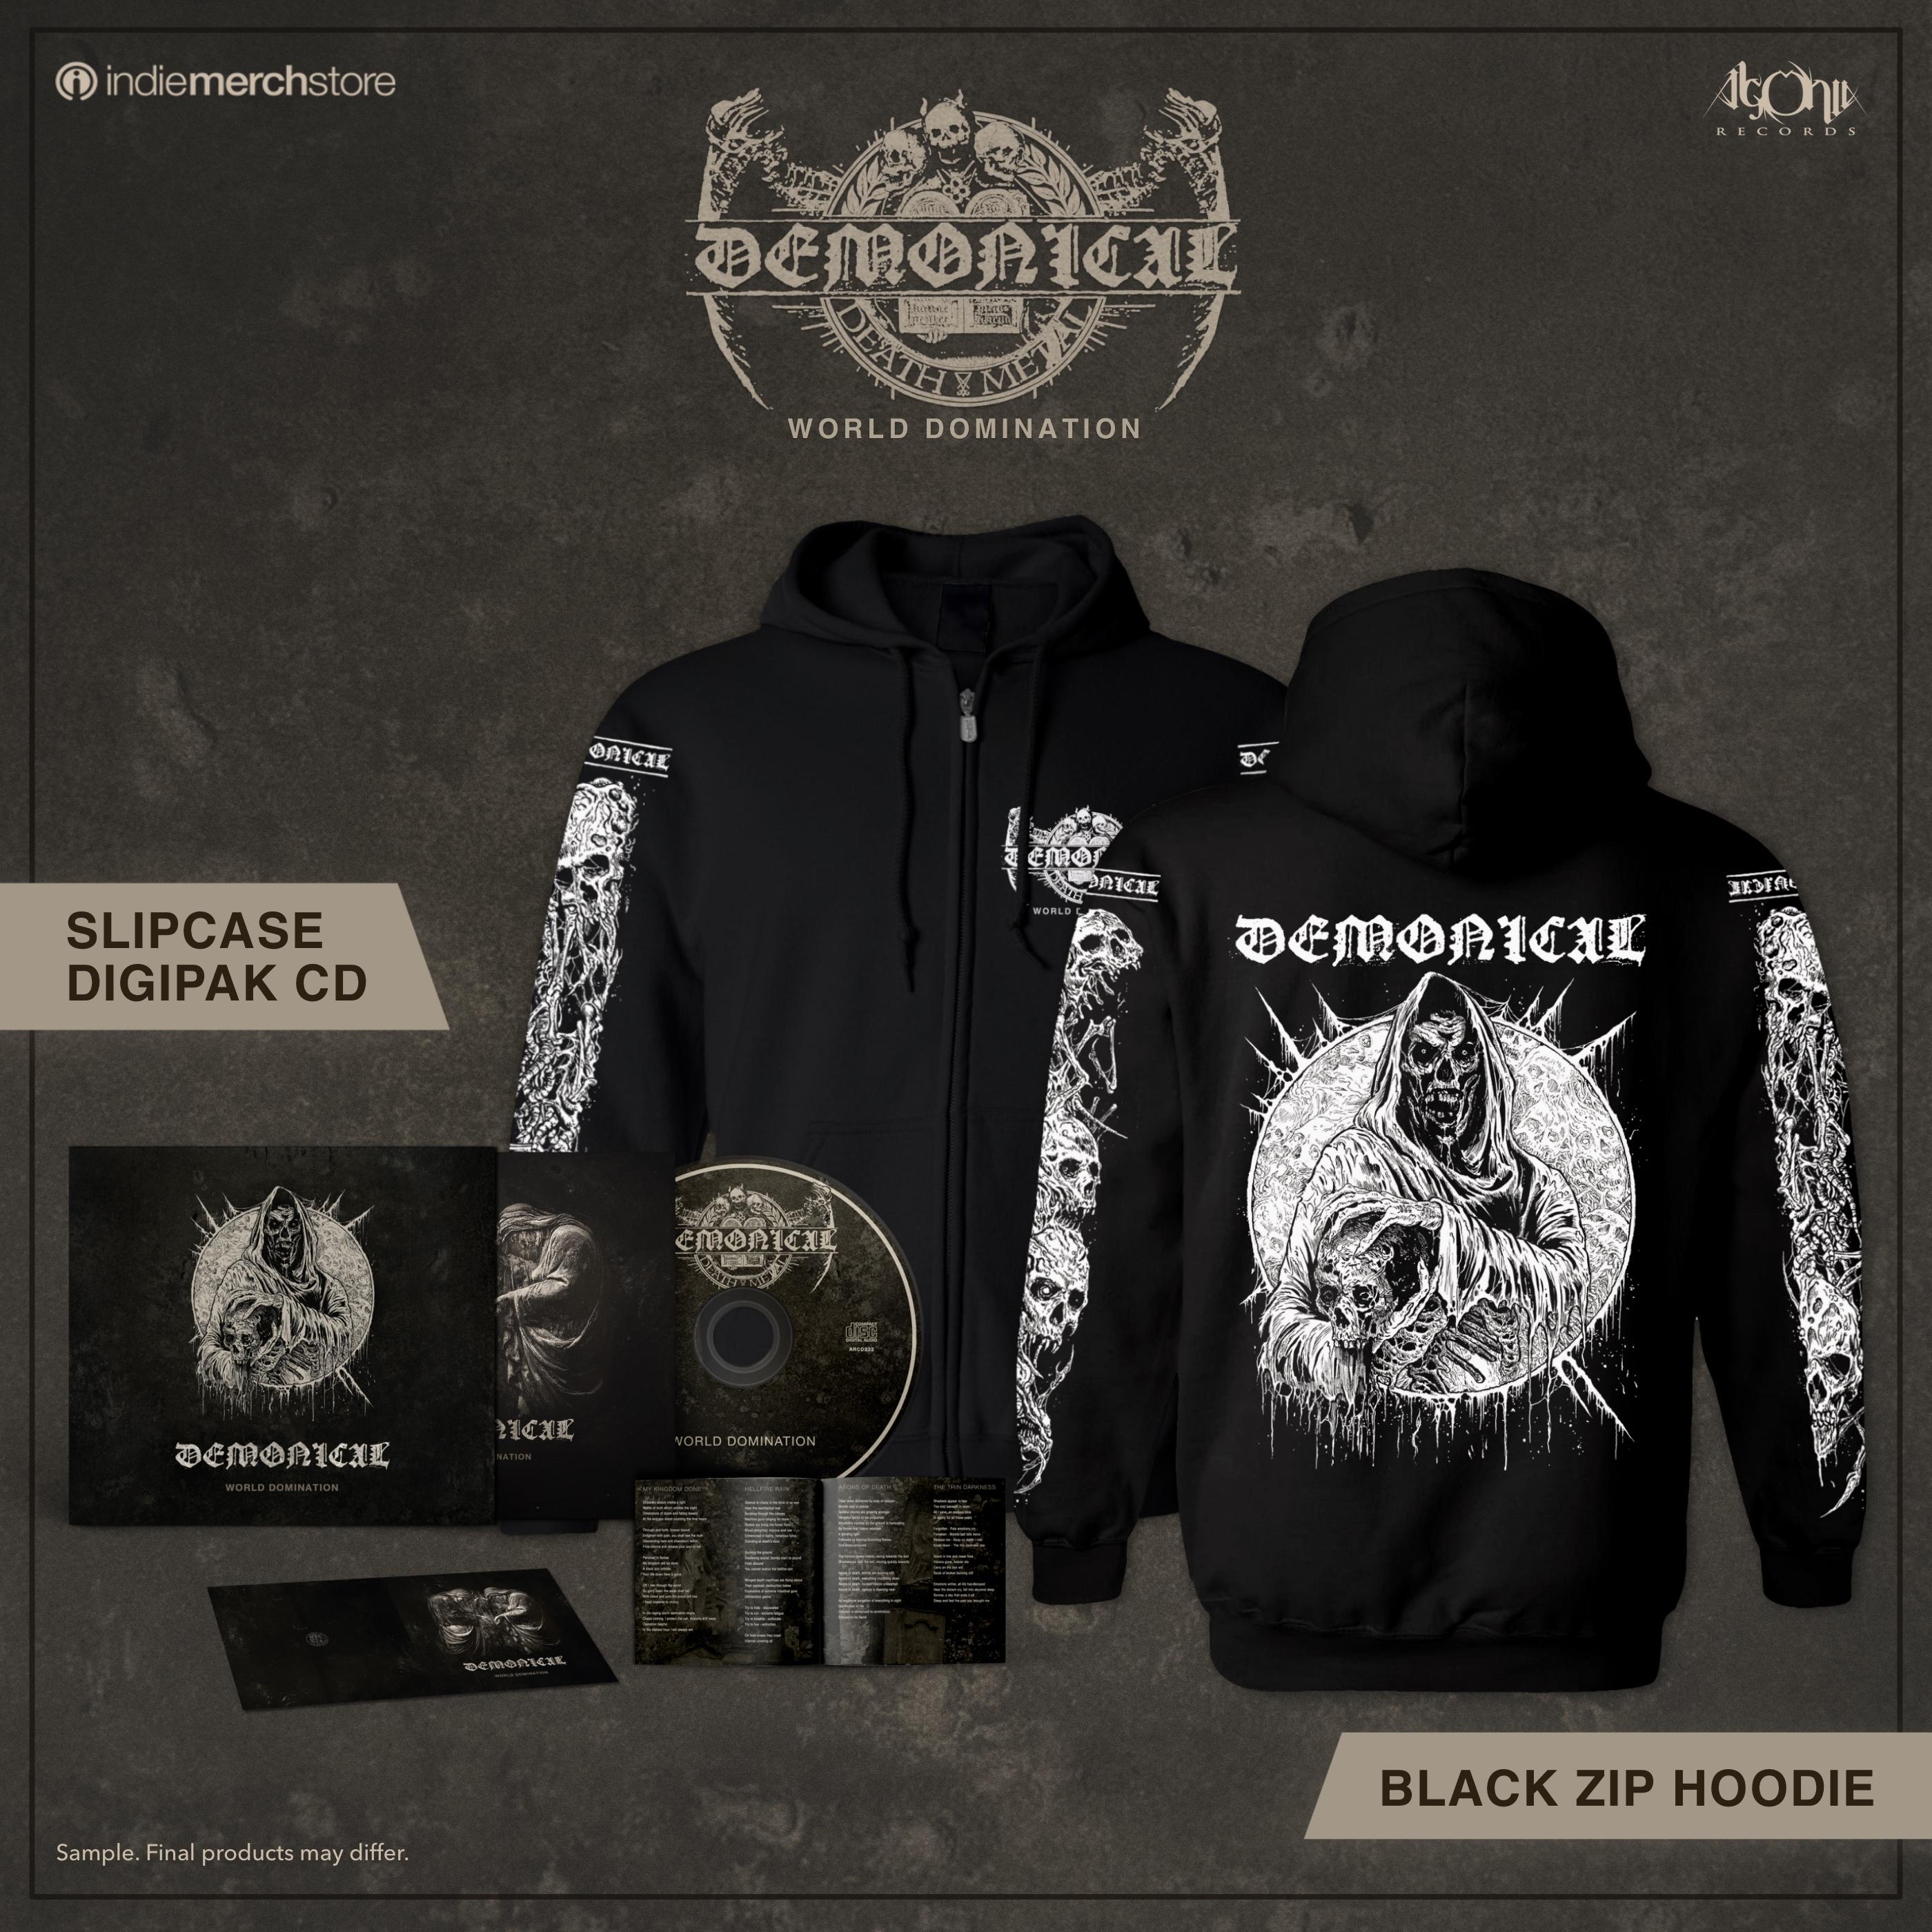 World Domination CD + Hoody Bundle